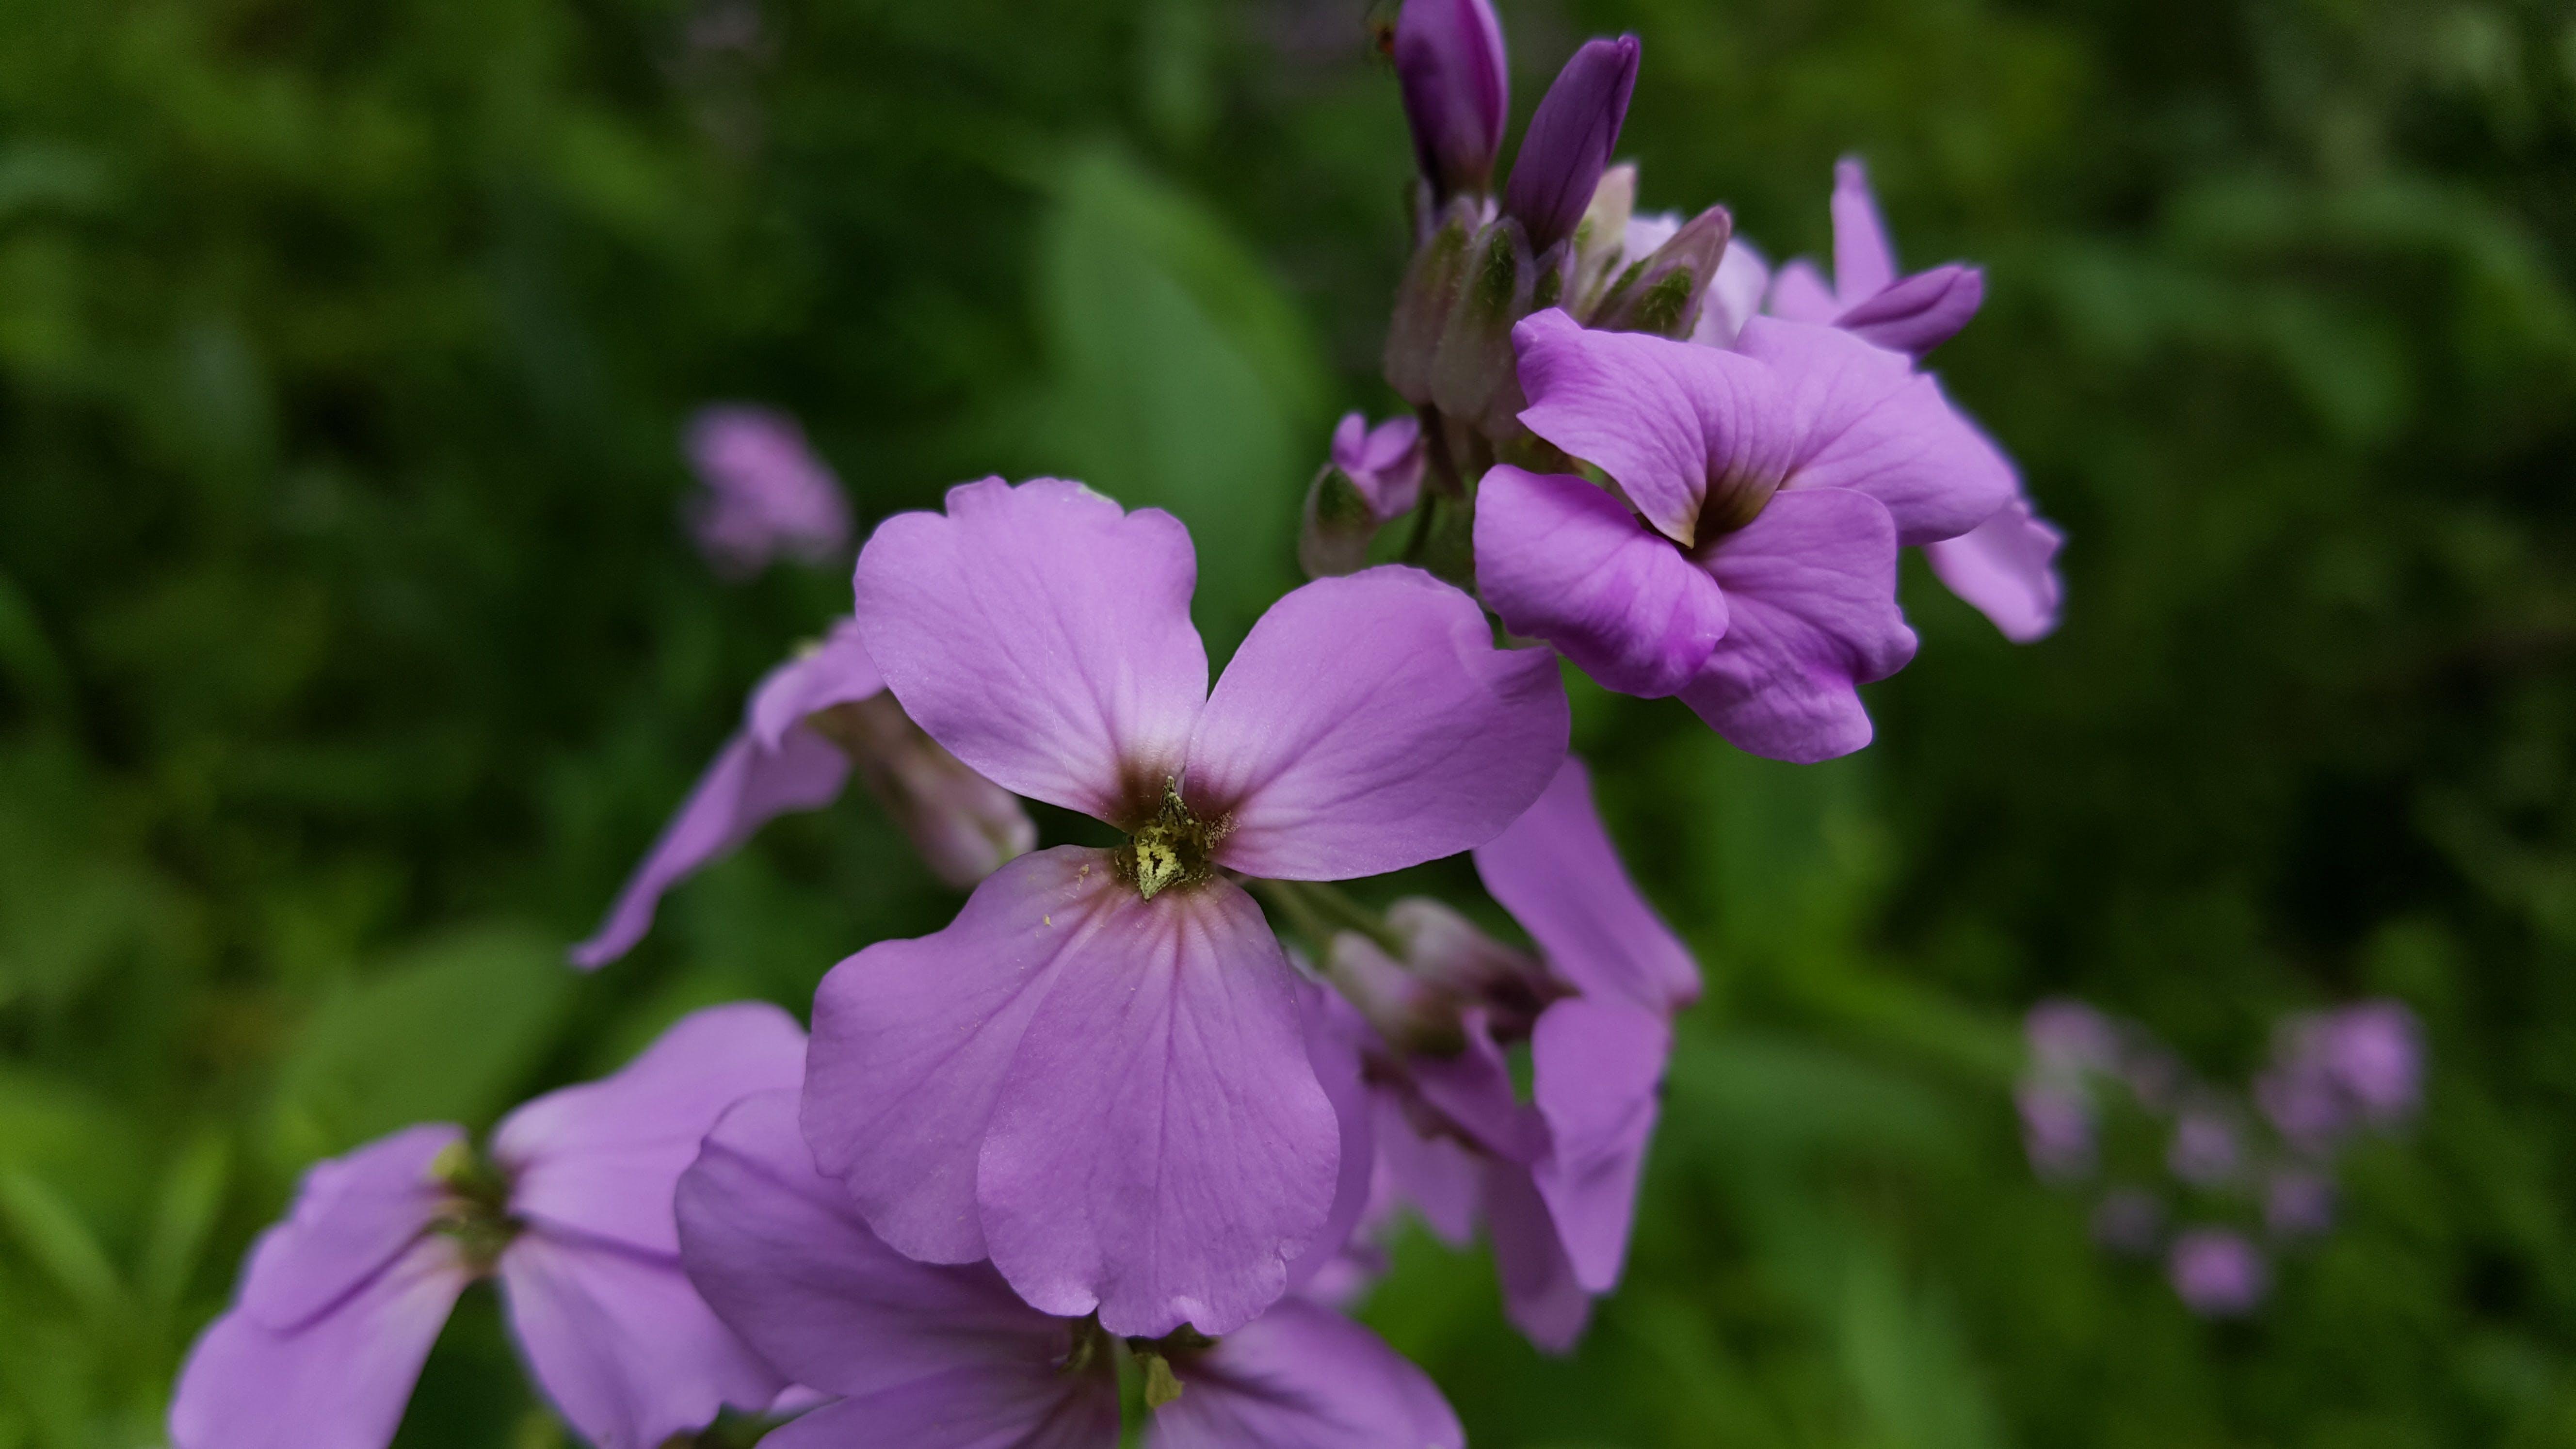 Free stock photo of spring, wild flowers